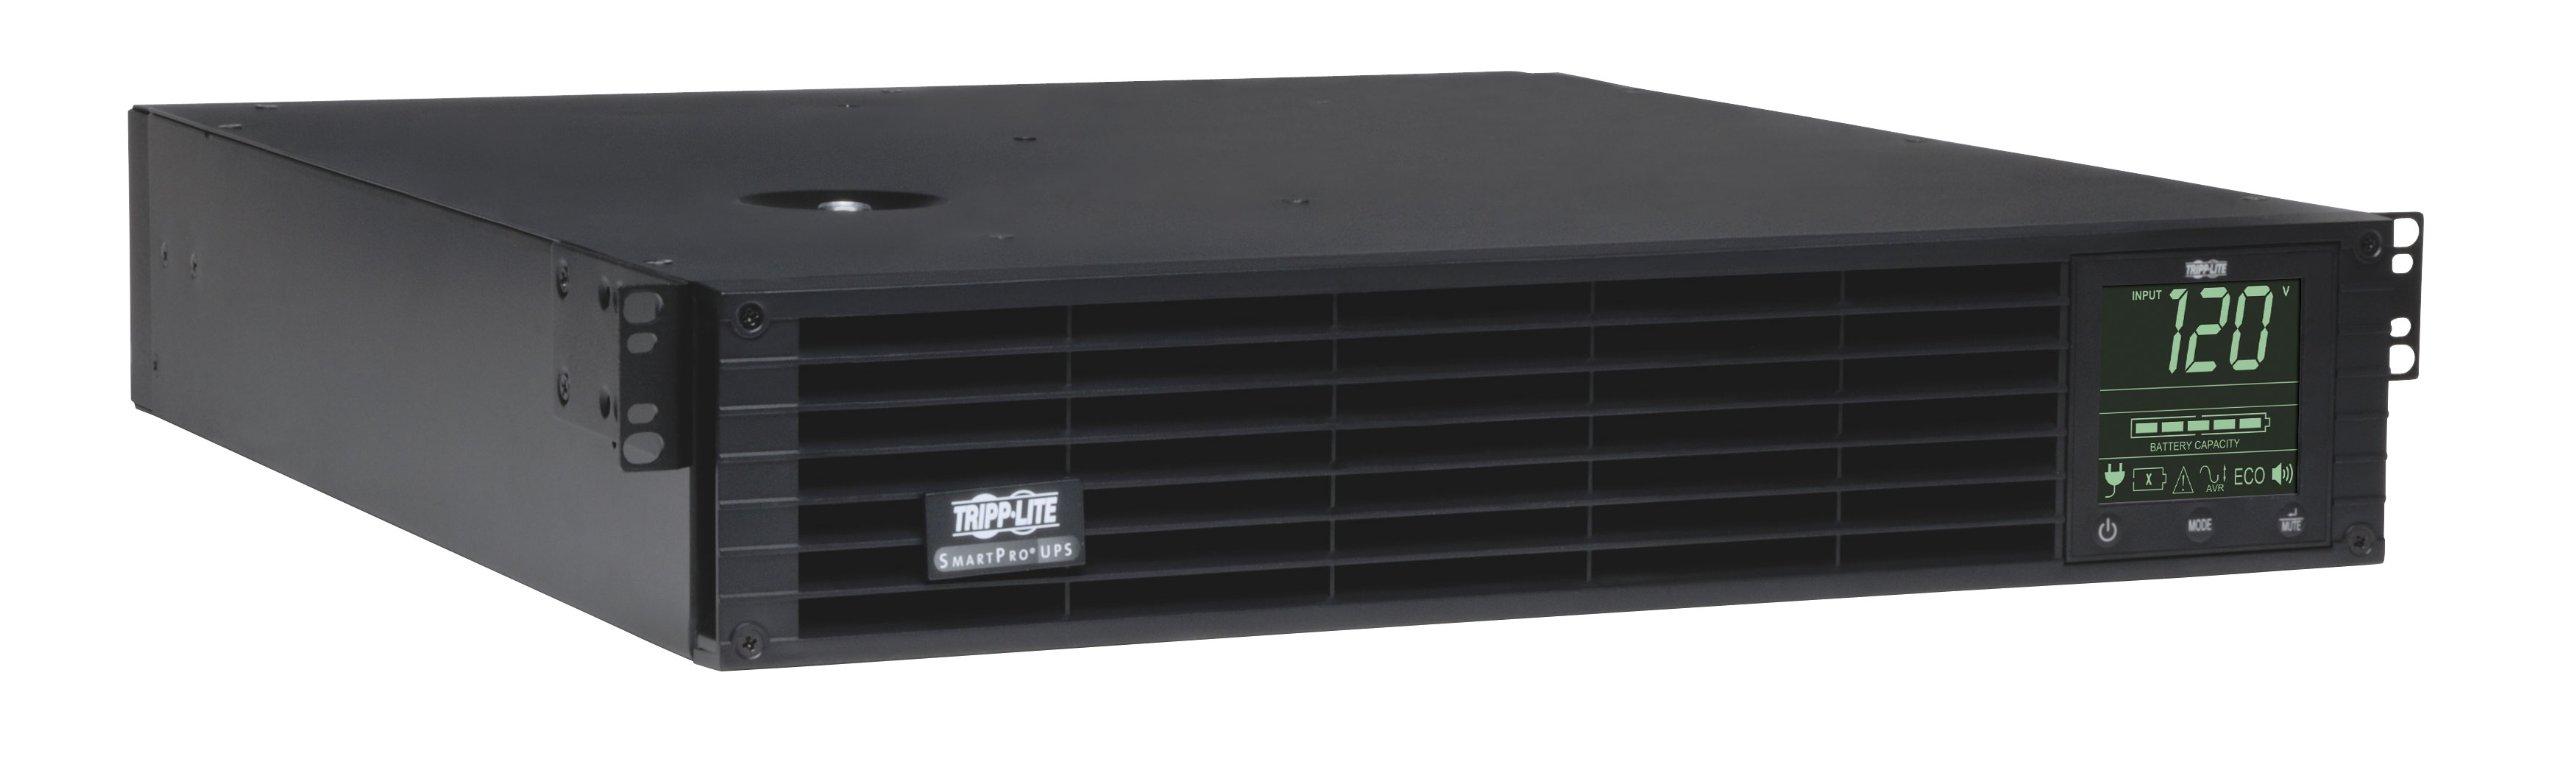 Tripp Lite 3000VA Smart UPS Back Up, Sine Wave, 2250W Line-Interactive, 2U Rackmount, Extended Run Option, LCD, USB, DB9 (SMART3000RM2U)